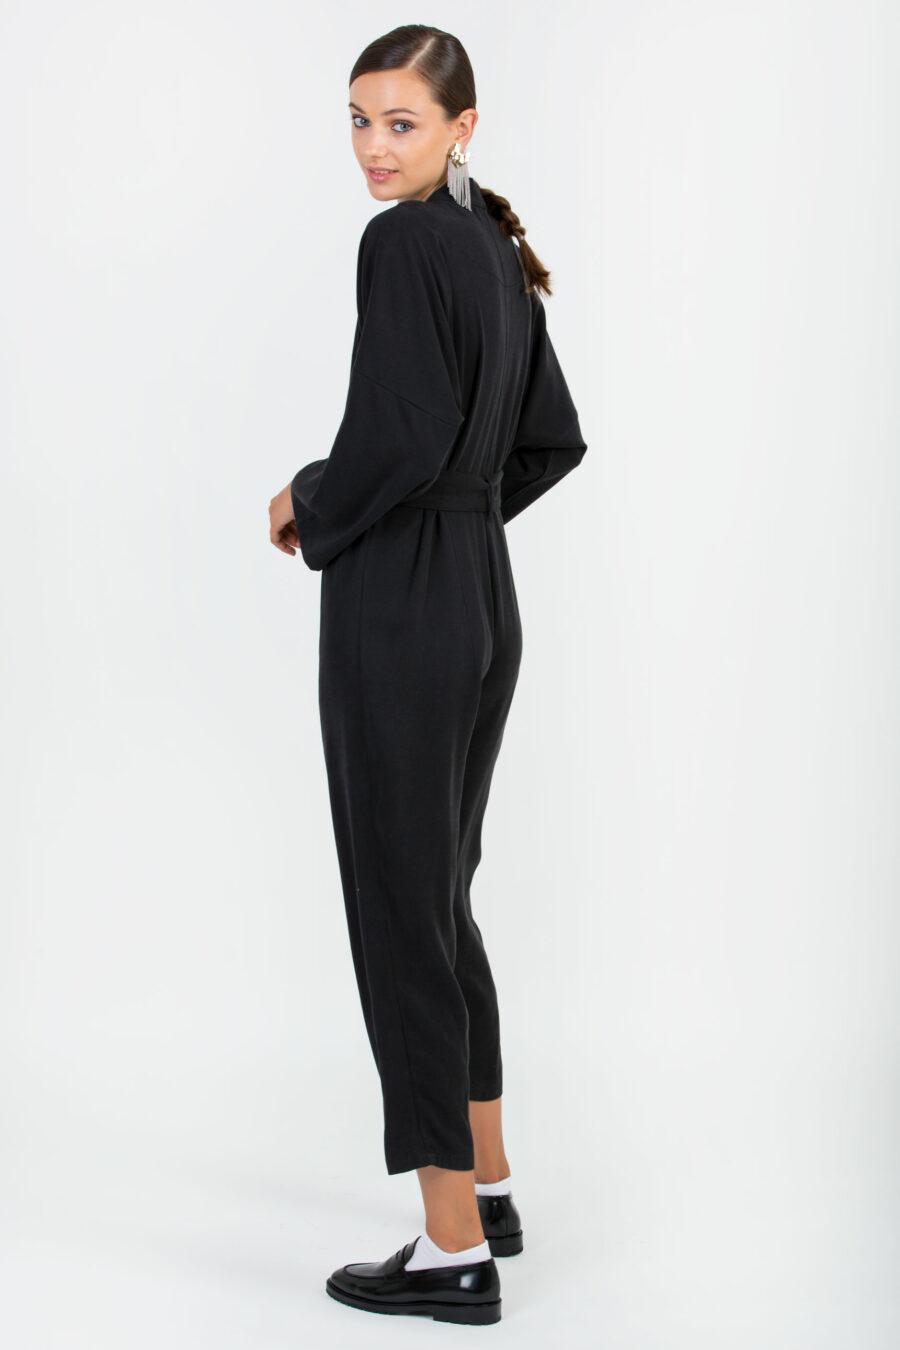 Coco Black Jumpsuit